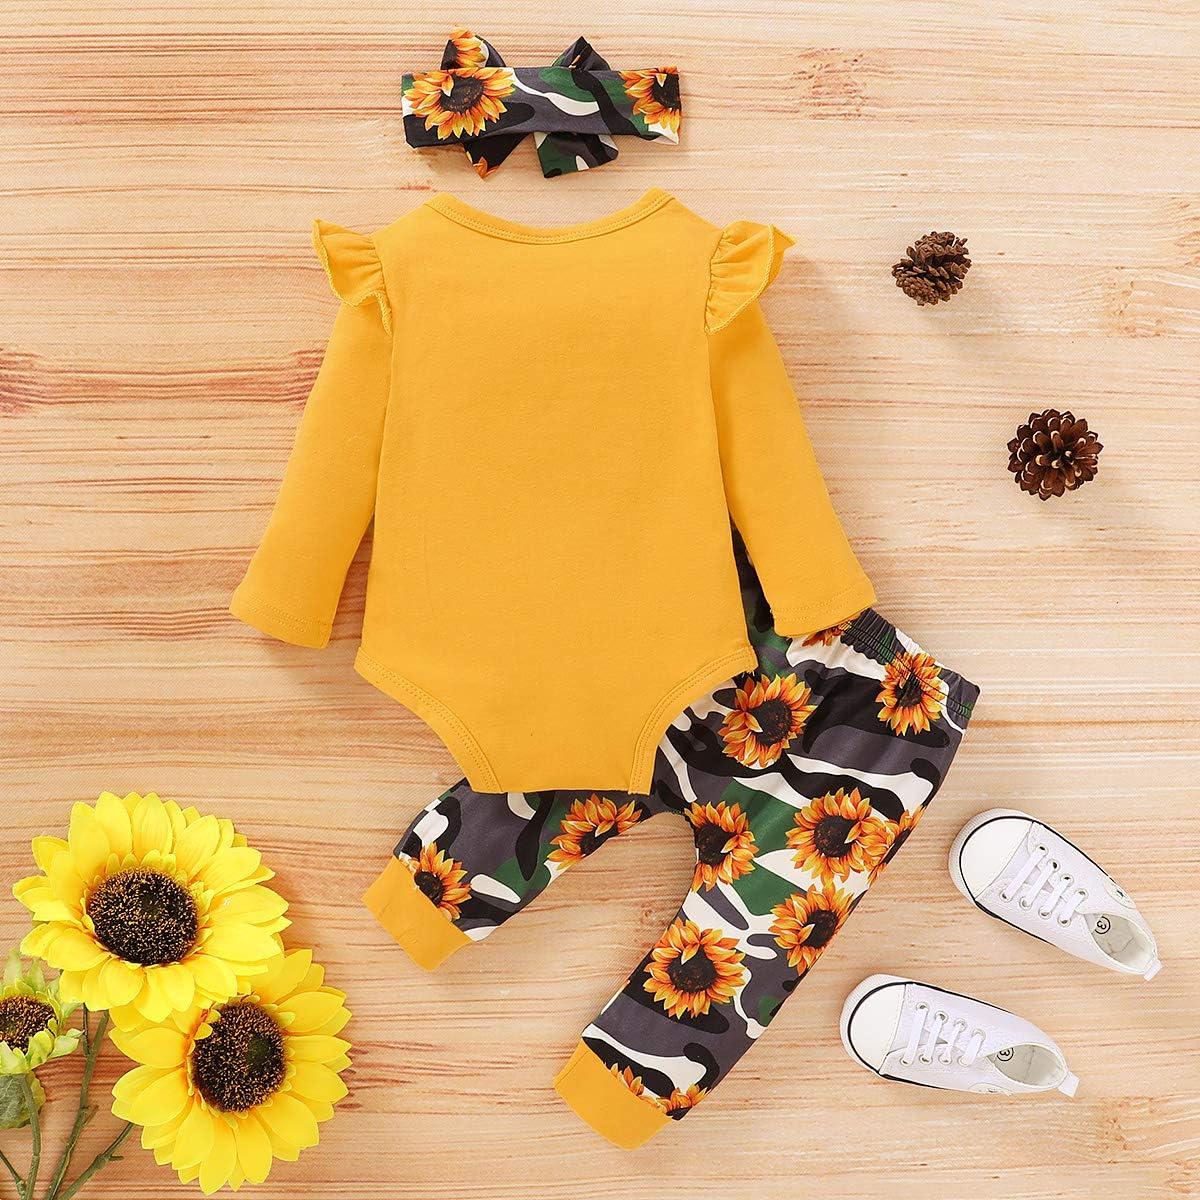 Newborn Baby Girls Knitted Shorts Set Cotton Ruffle Romper+Floral Shorts+Headband Summer 3Pcs Clothes Set